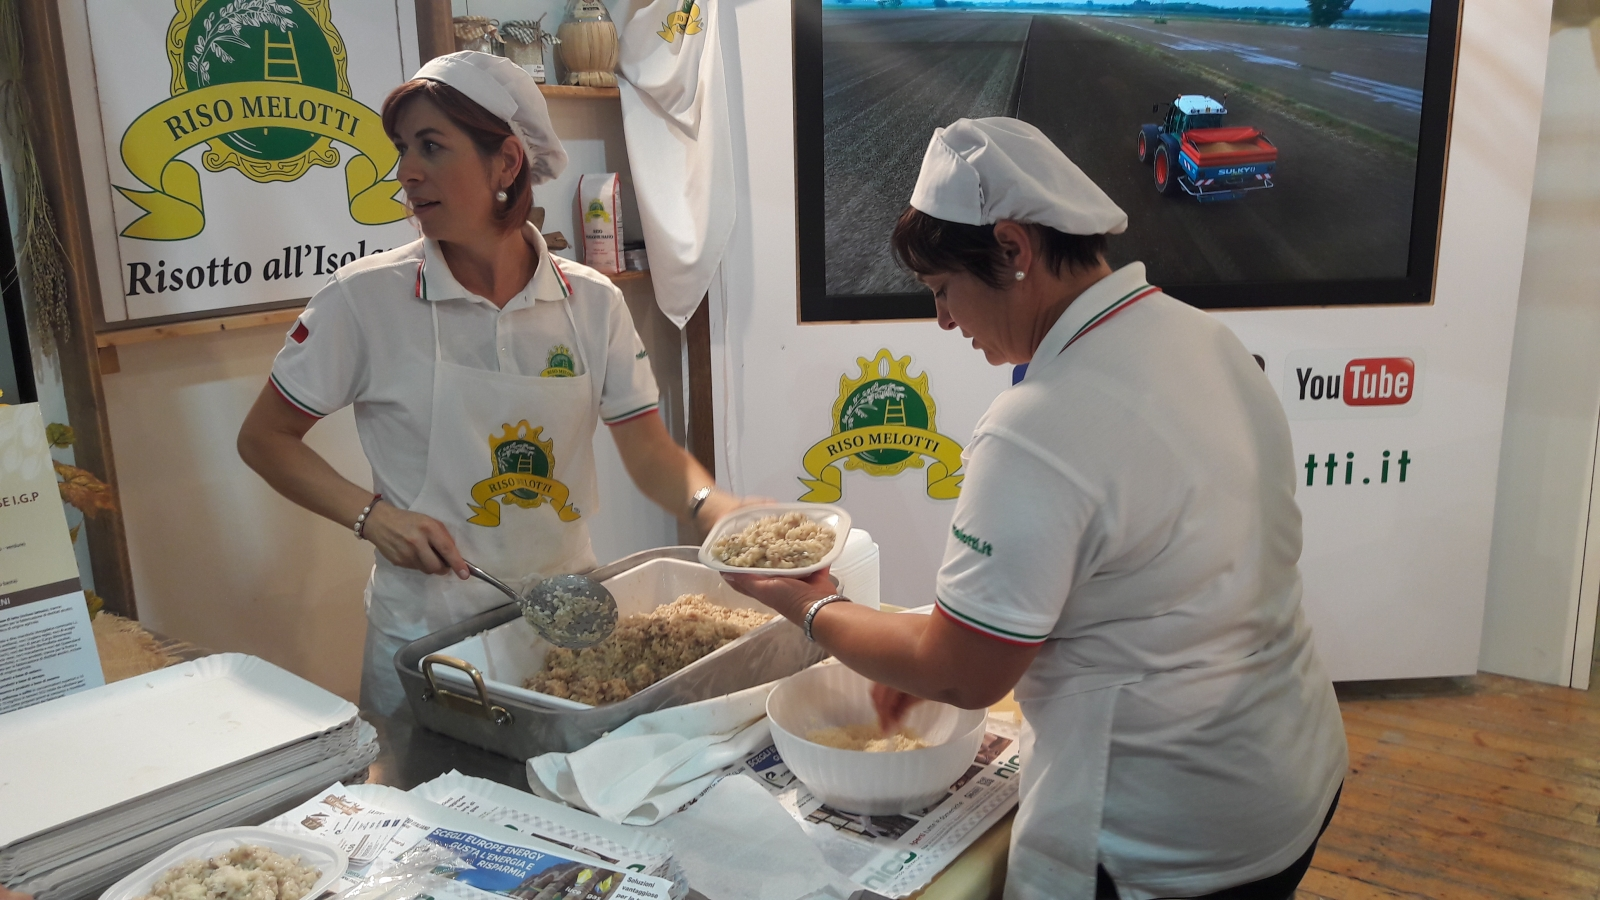 Reisfest in Isola (5)